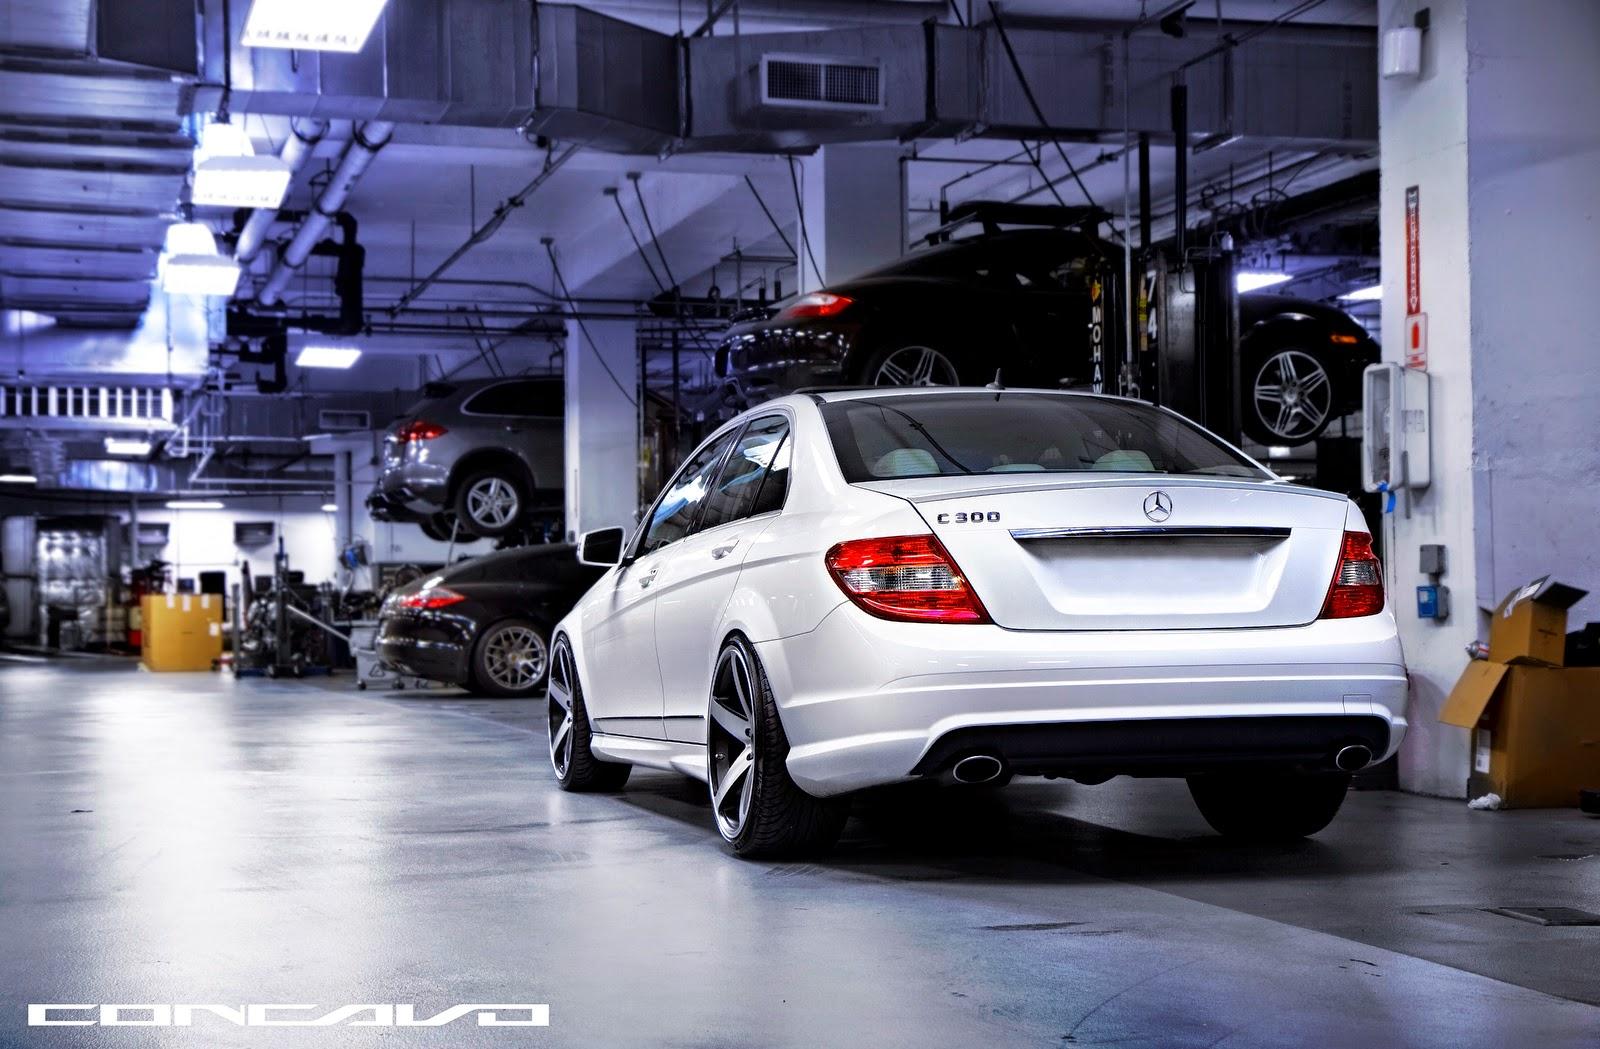 Mercedes benz w204 c300 on 20 cw 5 concavo wheels for Mercedes benz custom